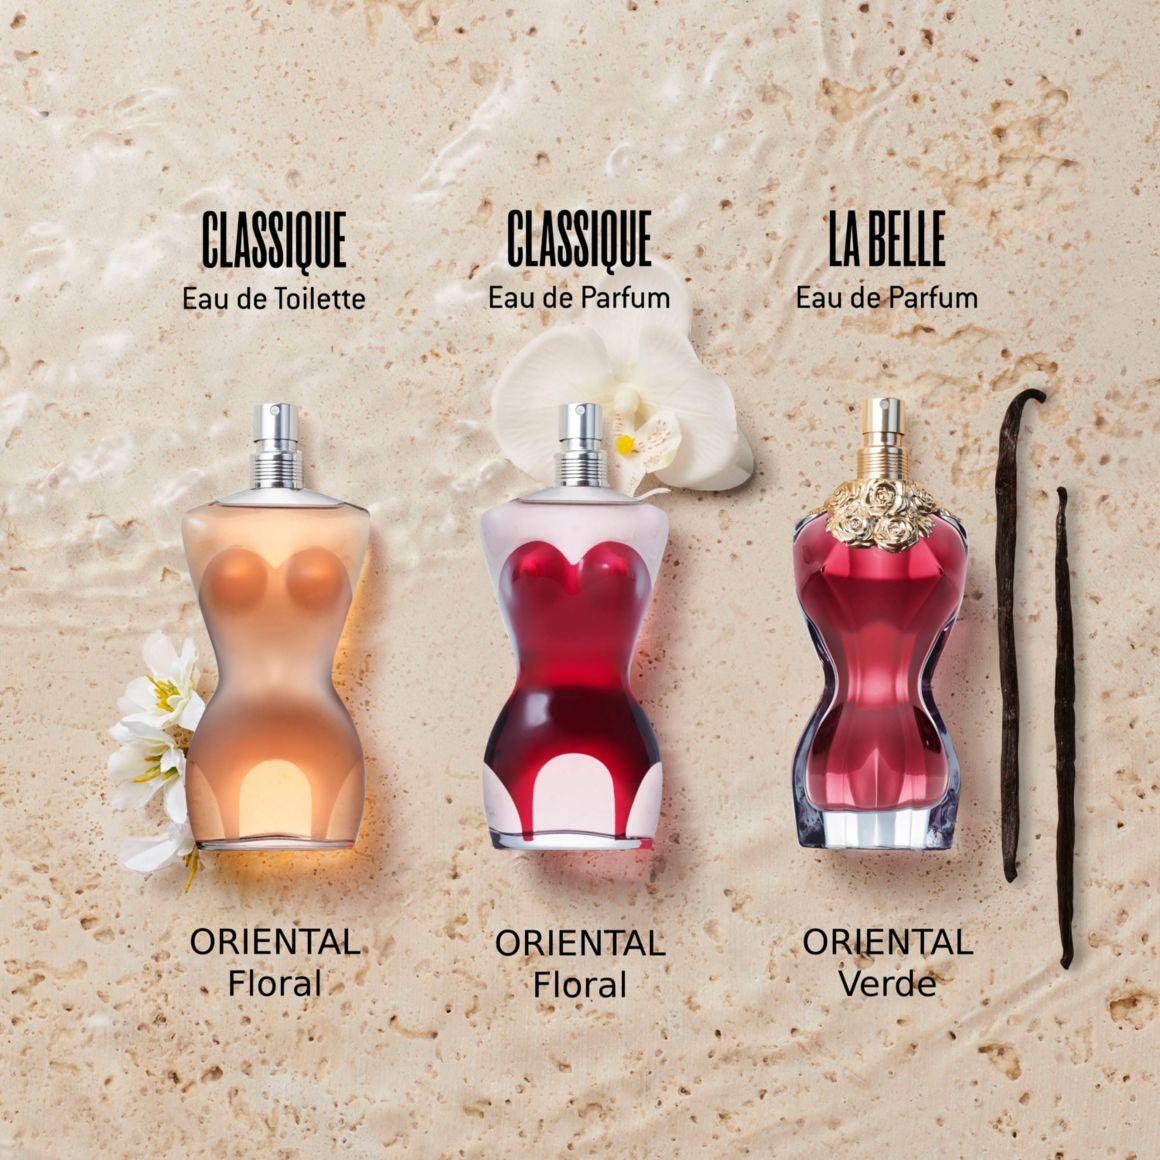 La Belle, Classique, Jean Paul gaultier, perfume, mujer, women, colonia, fragancia